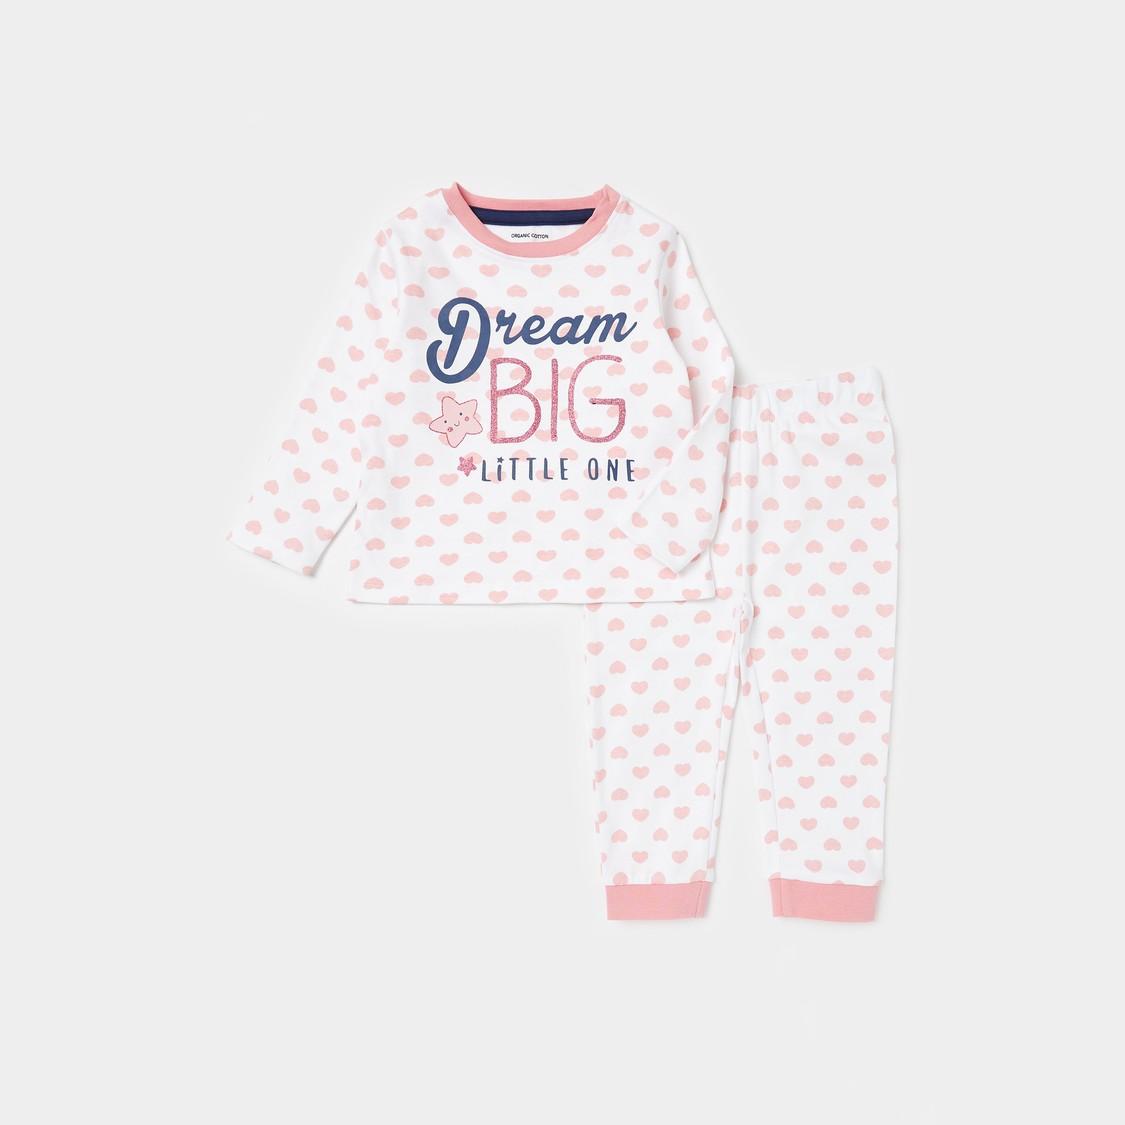 All-Over Print Long Sleeves T-shirt and Full Length Pyjama Set